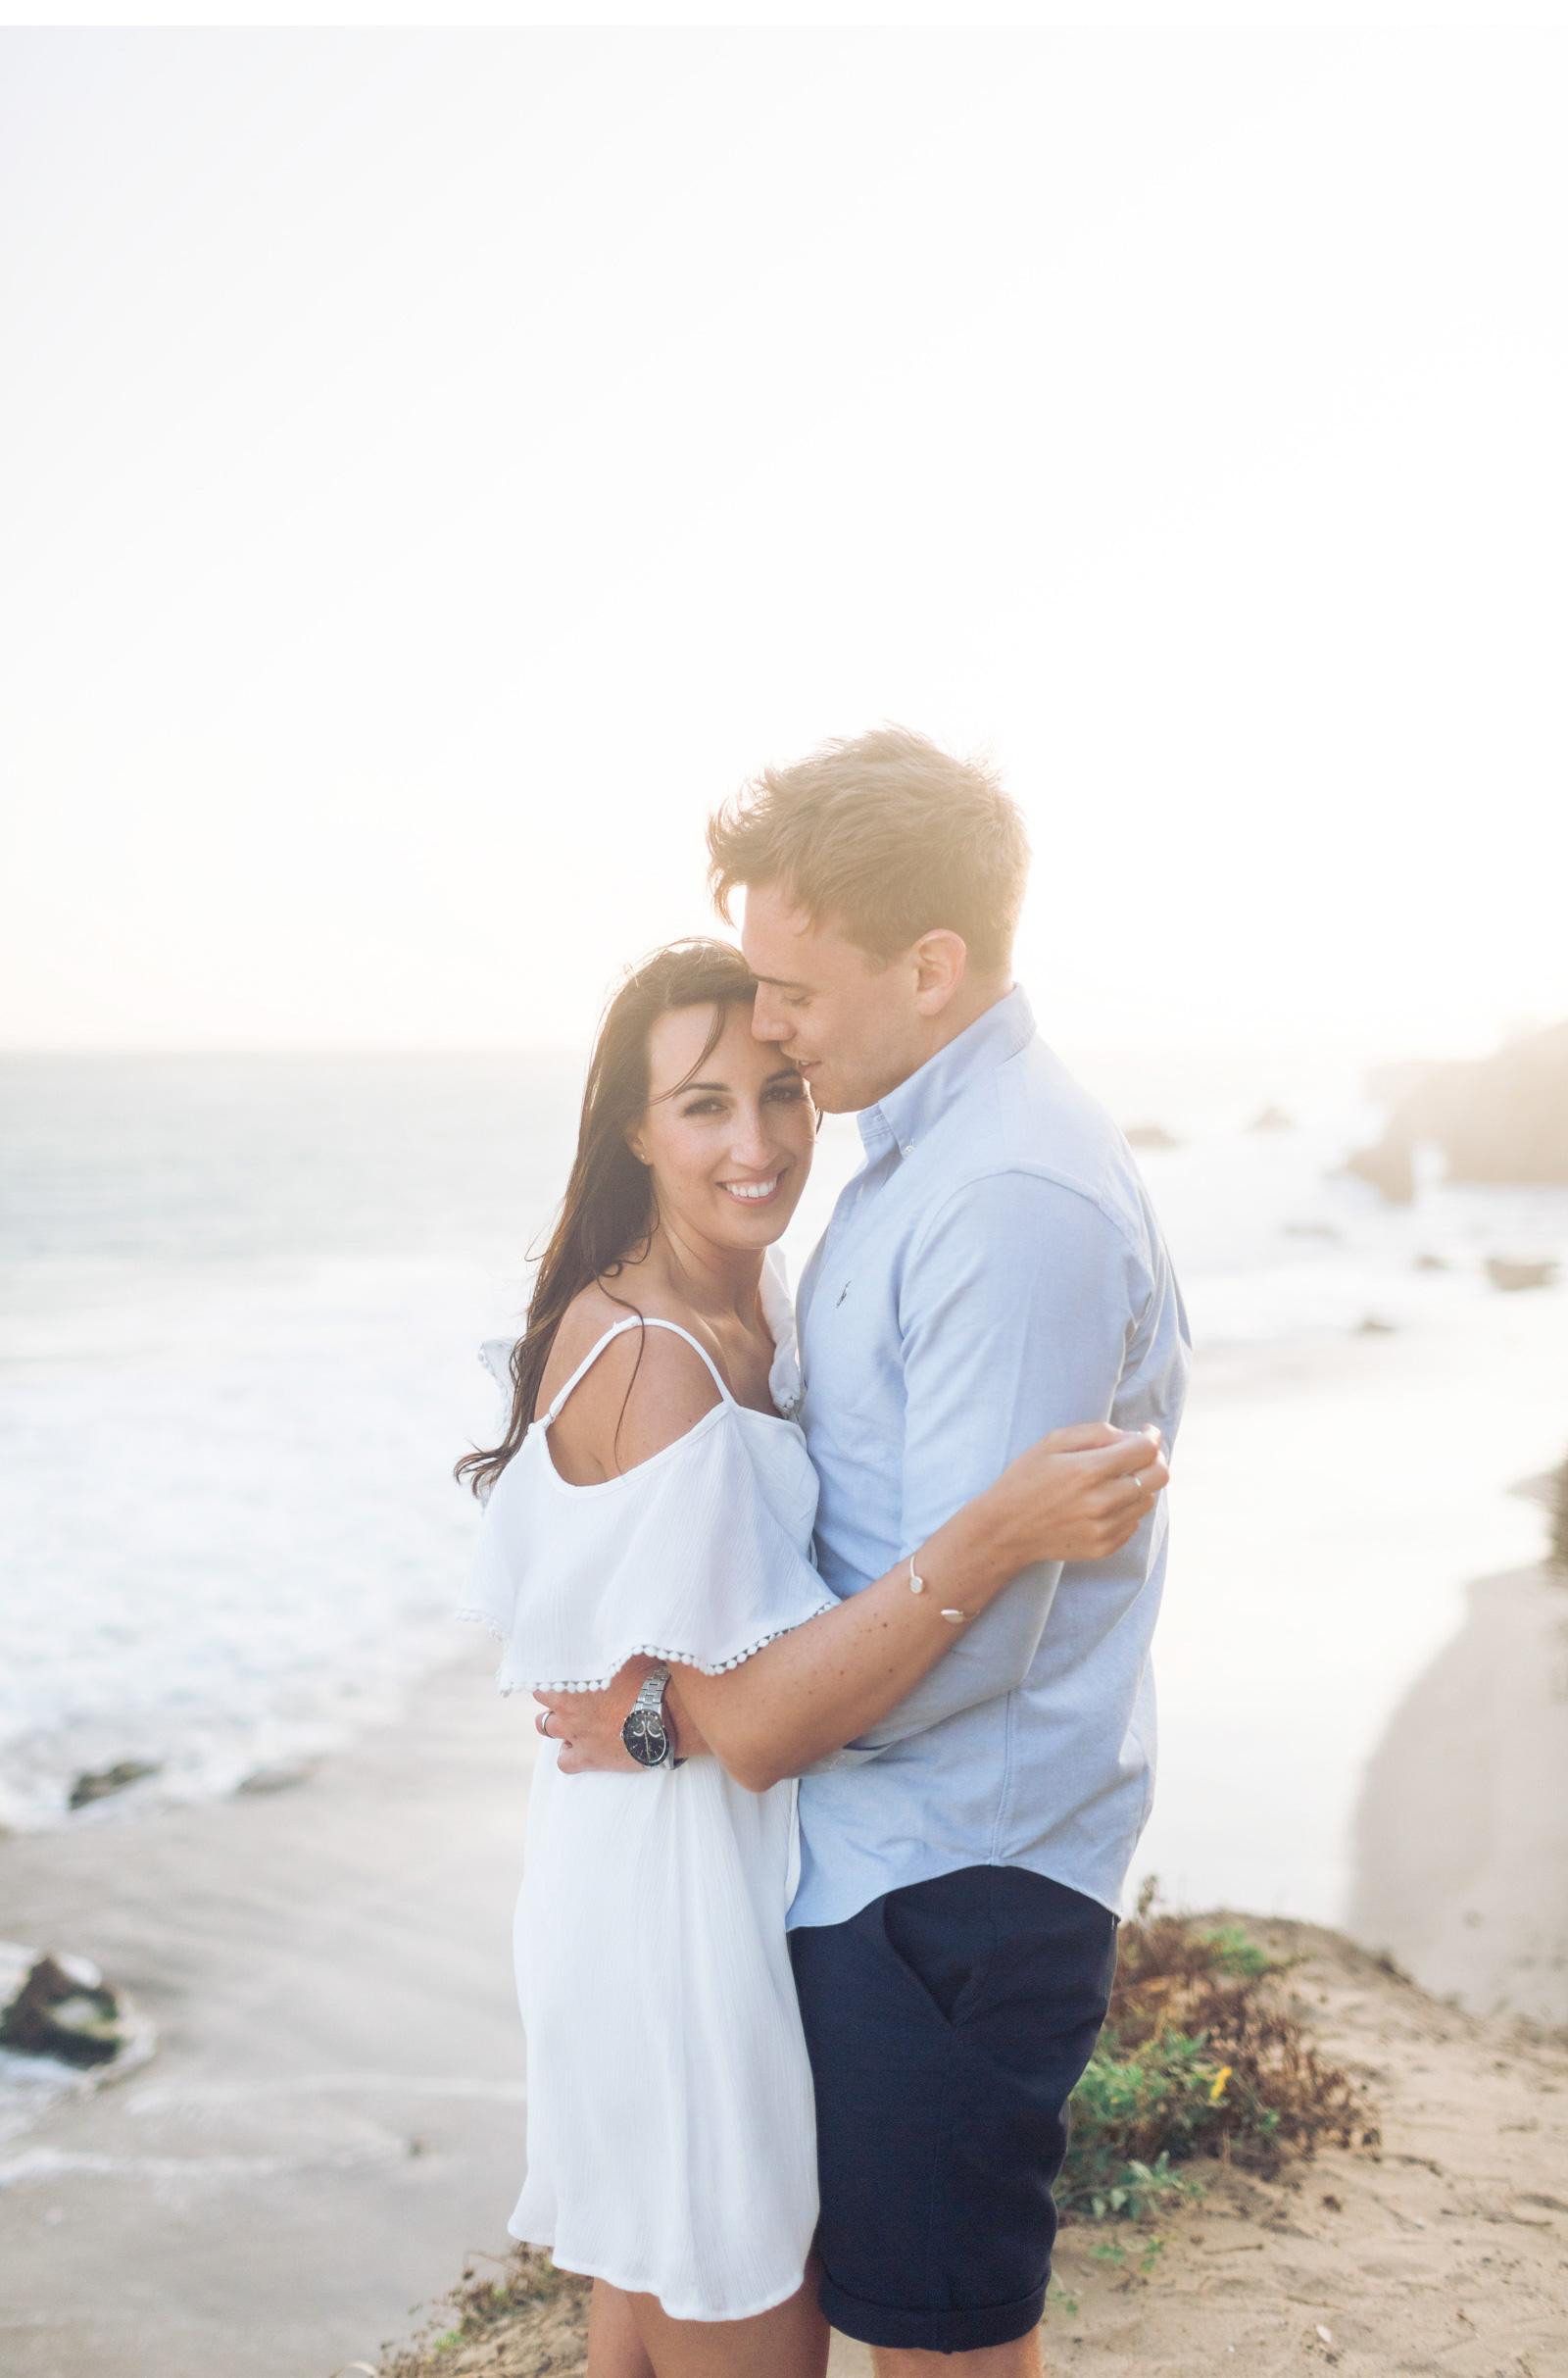 Malibu-California-Wedding-Photographer-Natalie-Schutt-Photography_04.jpg